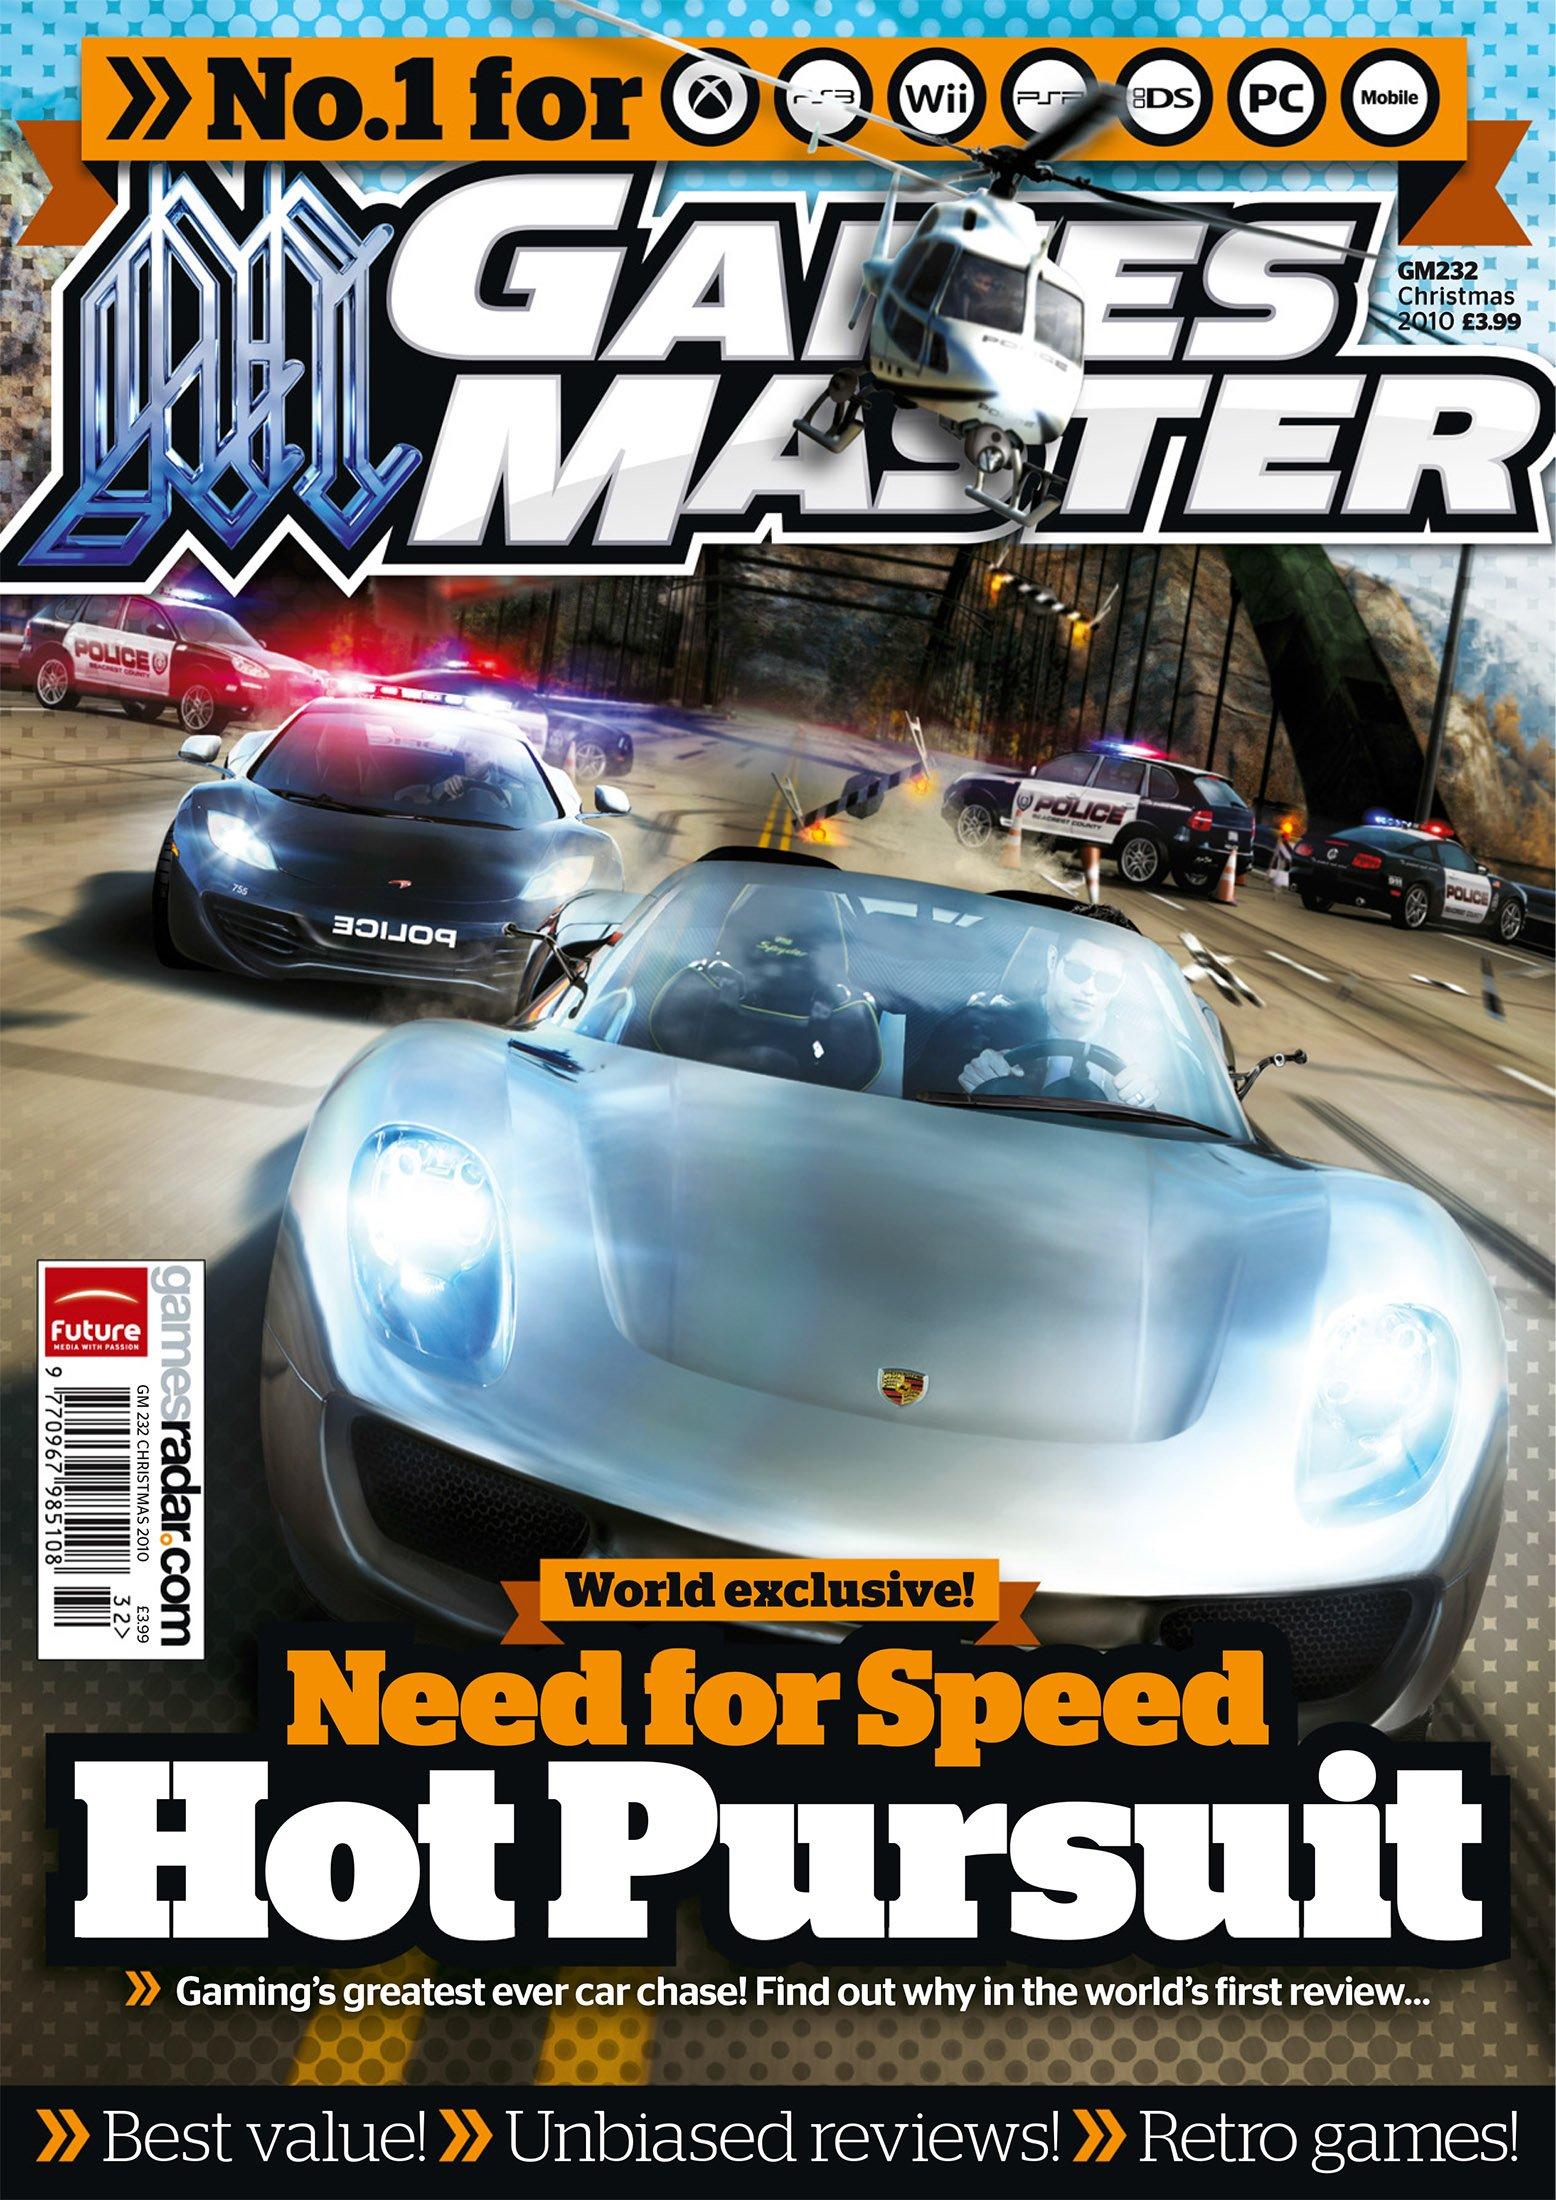 GamesMaster Issue 232 (Christmas 2010)